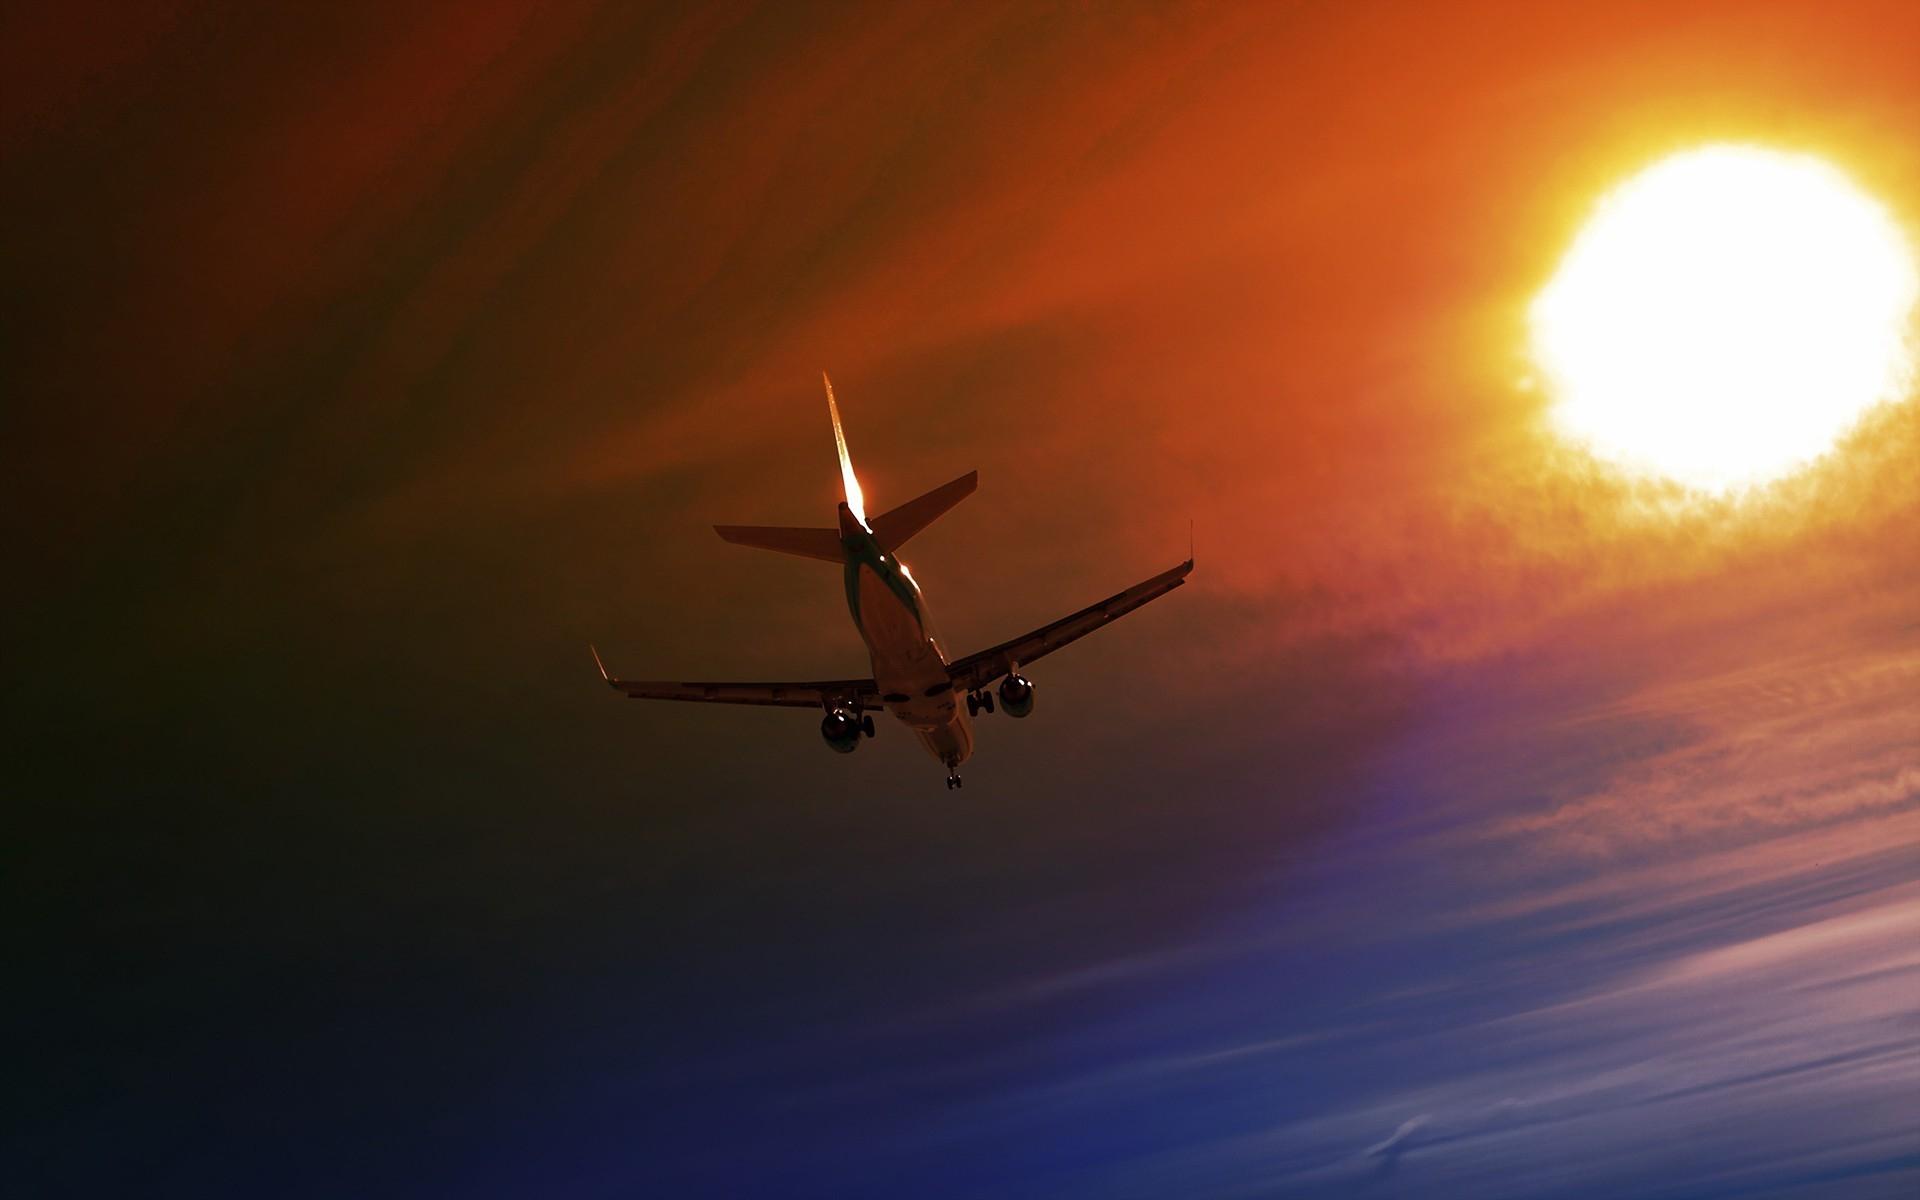 Simple Wallpaper Night Airplane - plane-sky-night-Flight-645734  Trends.jpg